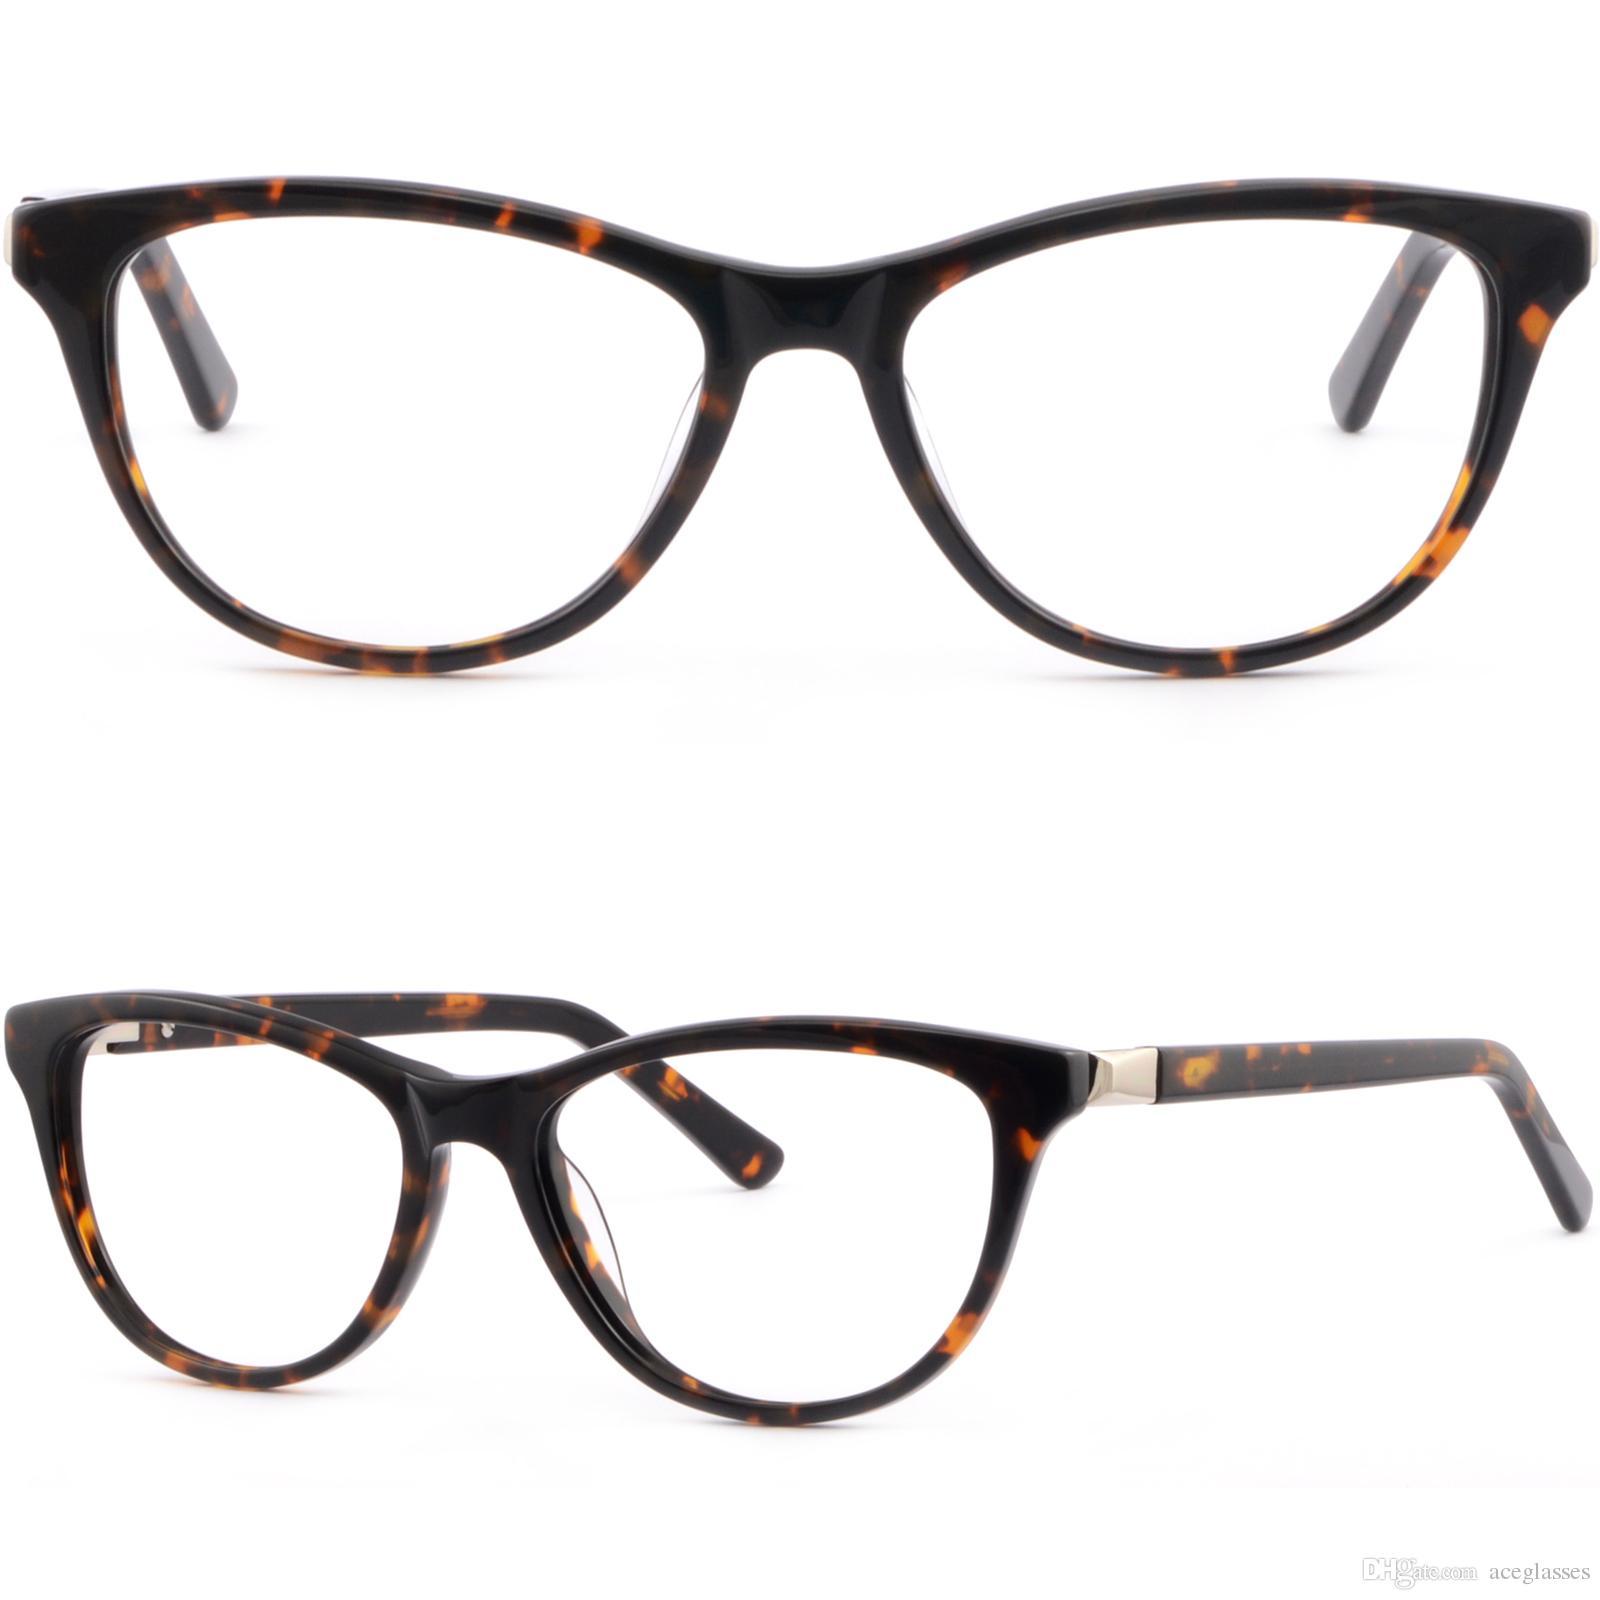 5b0390103da Full Rim Womens Cateye Cat Eye Acetate Plastic Frame Spring Hinges  Tortoiseshell Big Eyeglasses Frames Black Eyeglasses Frames From  Aceglasses